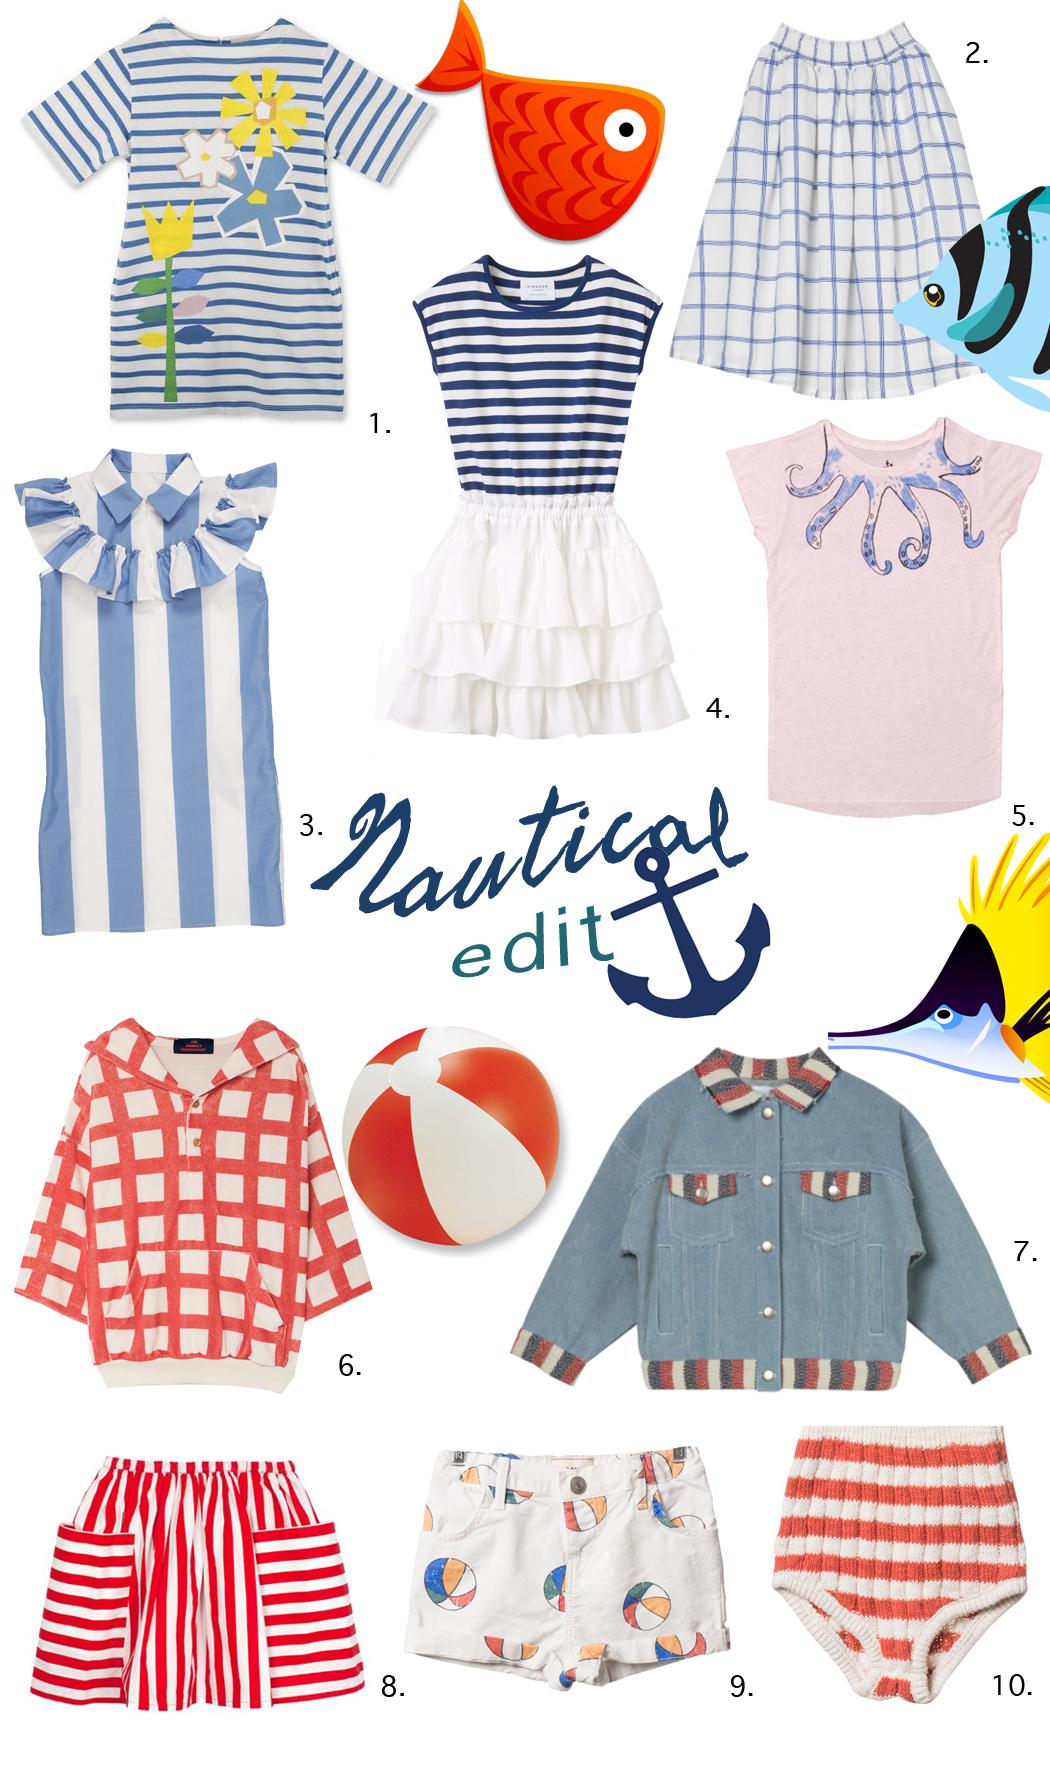 Junior Style Kids Fashion Blog - New Nautical Trends #kidsfashion #kidstyle, #edit #trends #nautical